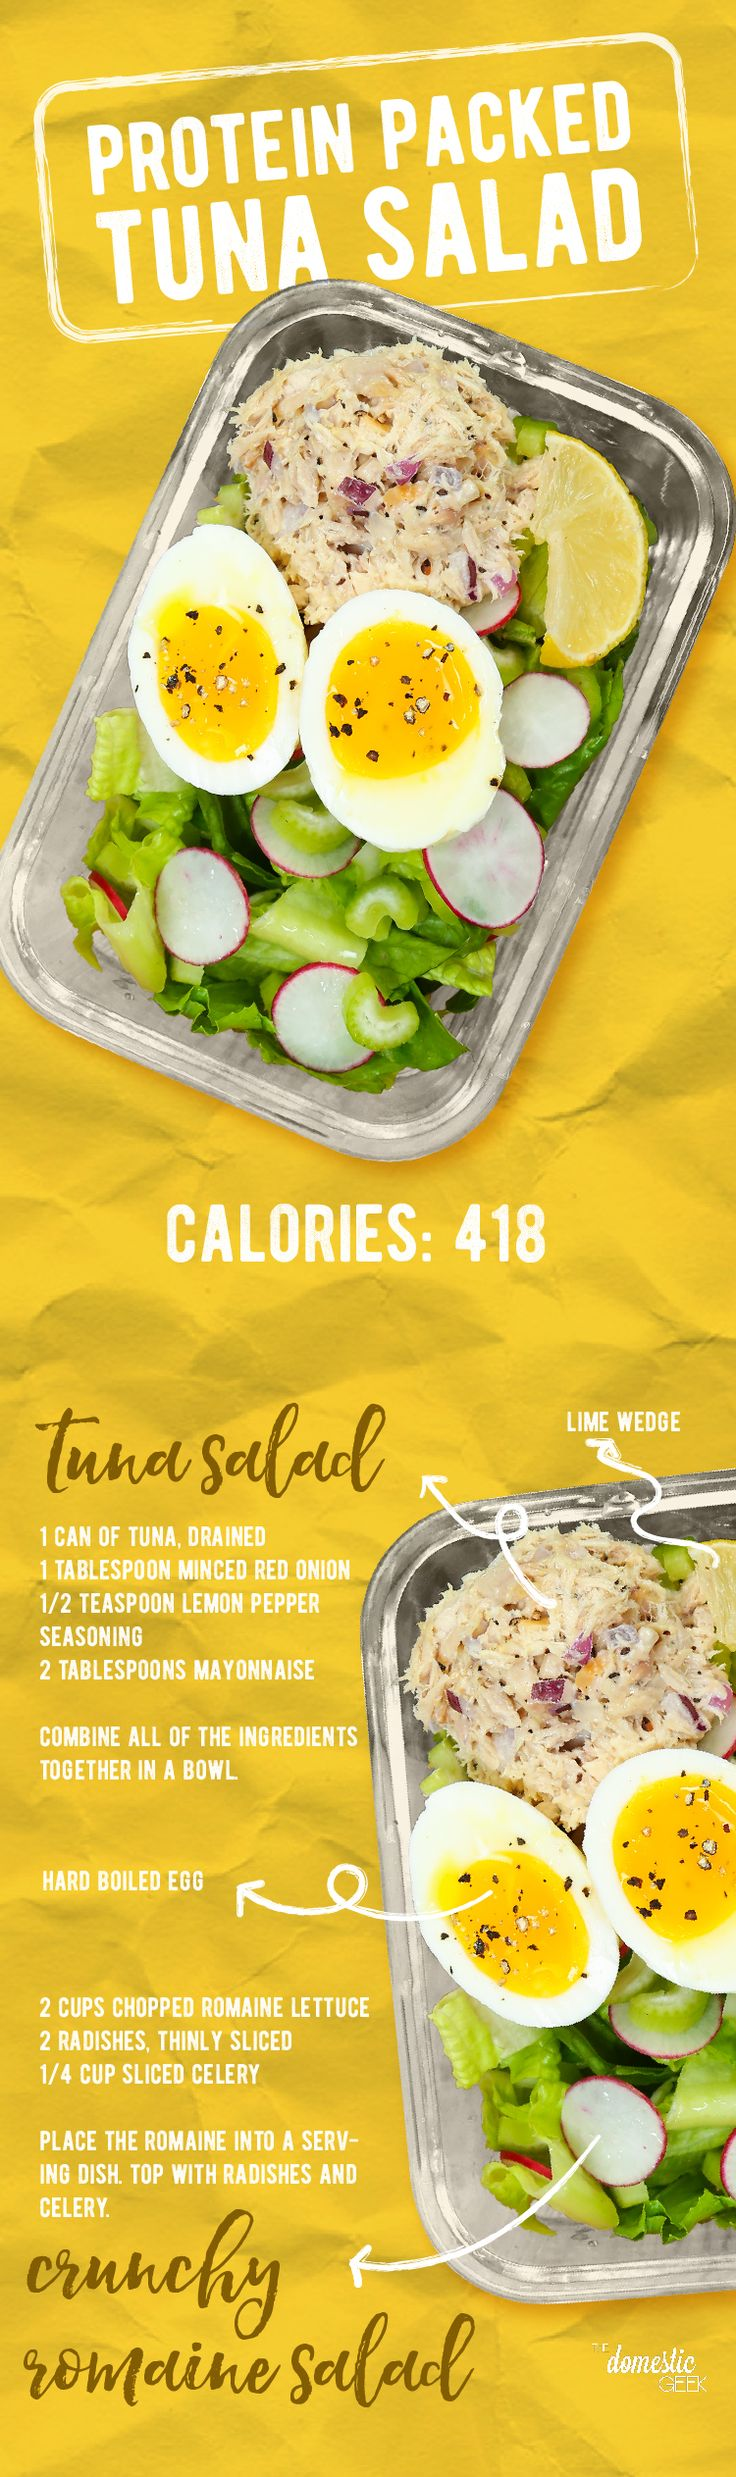 Protein Packed Tuna Salad Box!